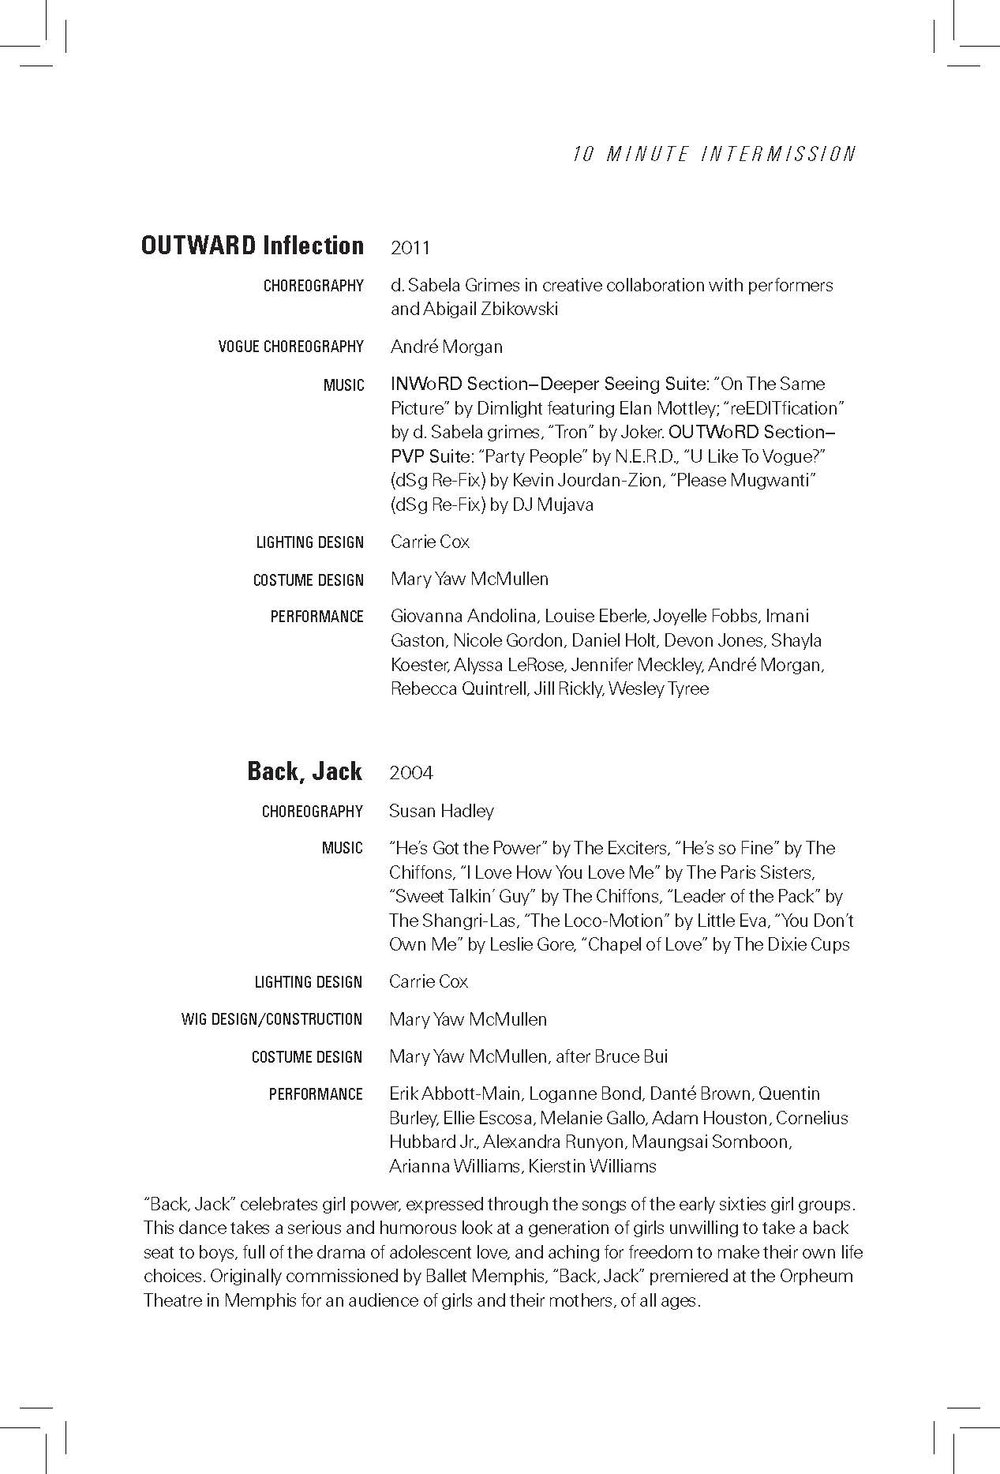 SP11_DanceDowntown_Page_3.jpg